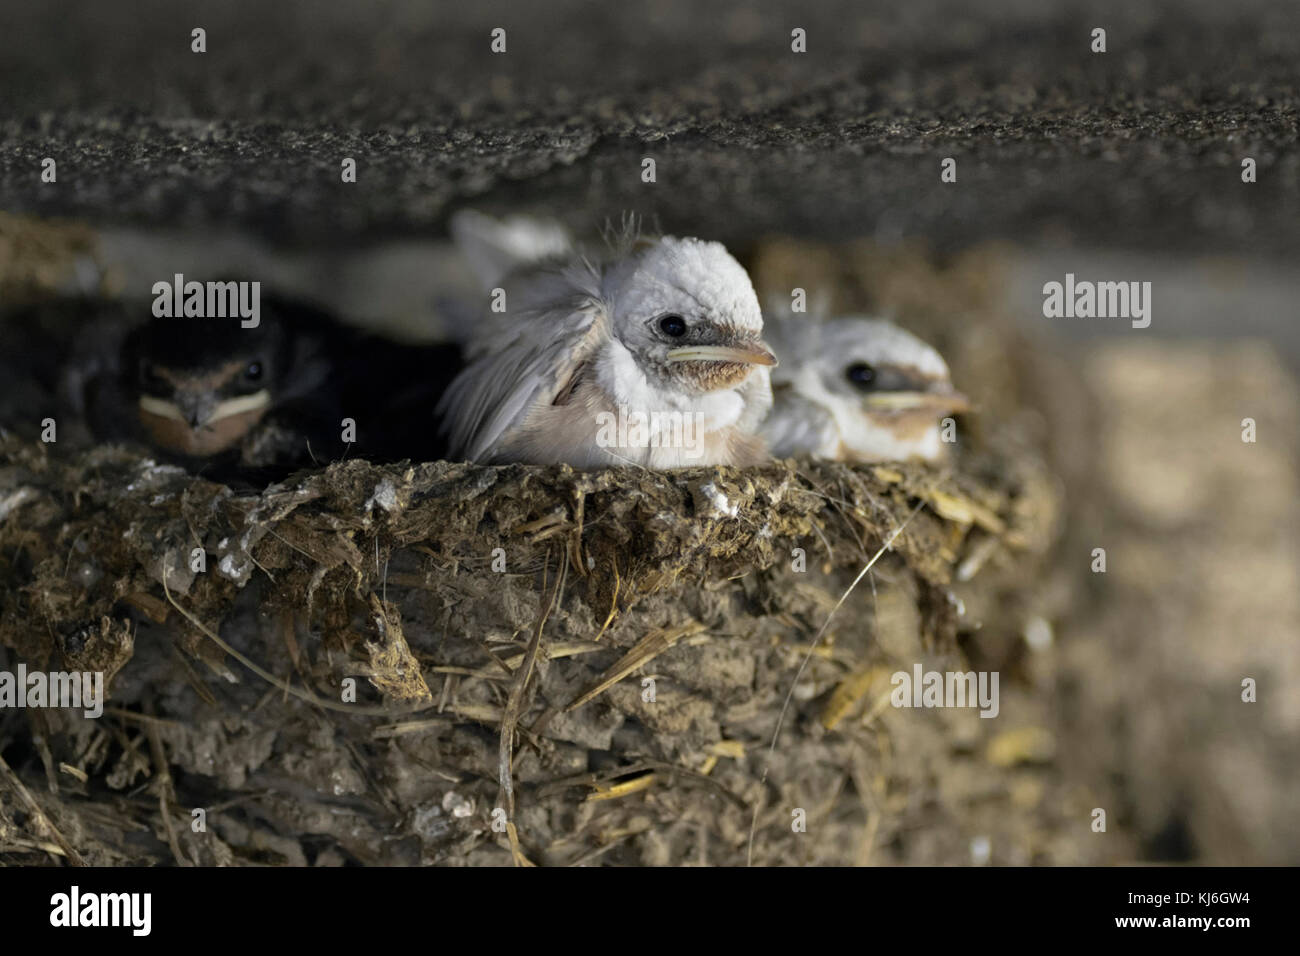 Barn Swallows / Rauchschwalben ( Hirundo rustica ), chicks in nest, two of them with a rare gene mutation, white - Stock Image